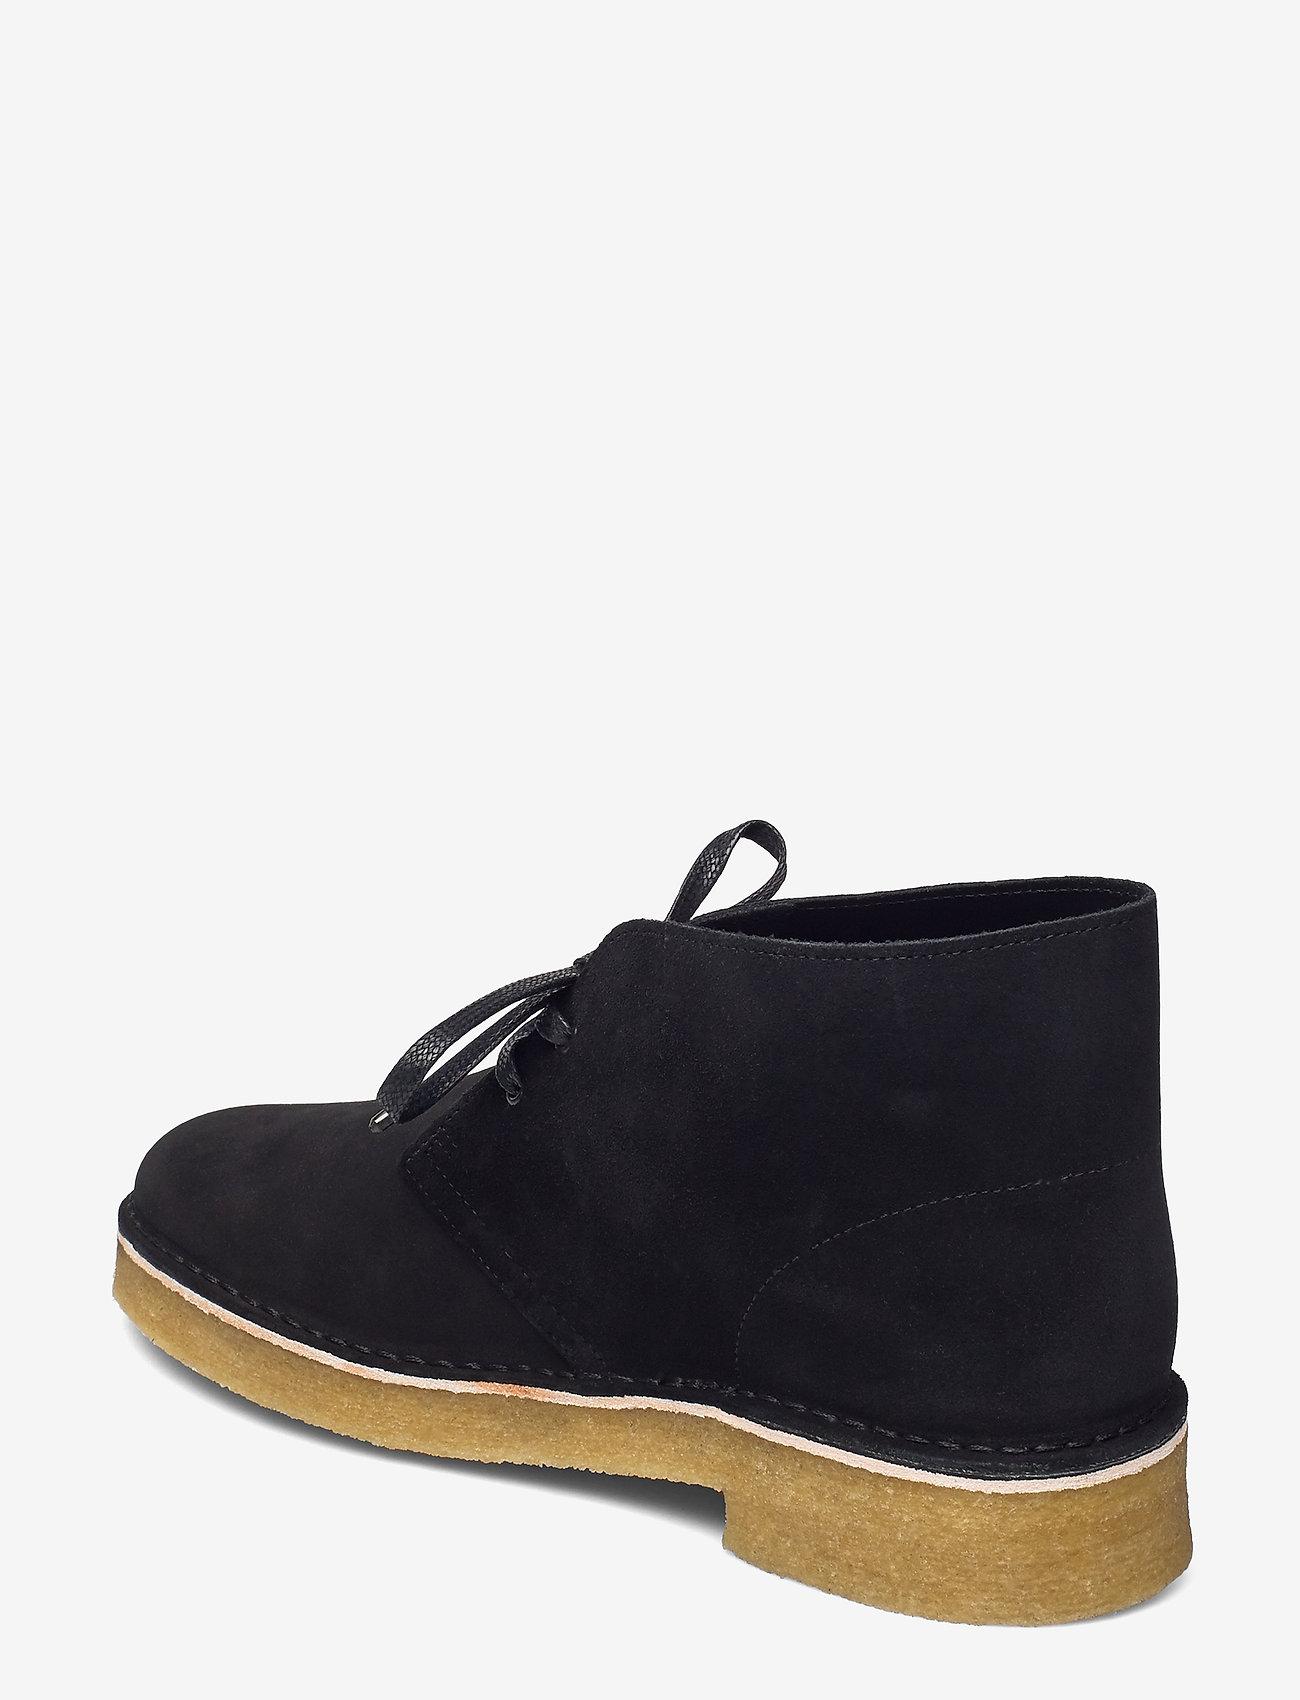 Clarks Originals - Desert Boot221 - Ökenkängor - black sde - 2